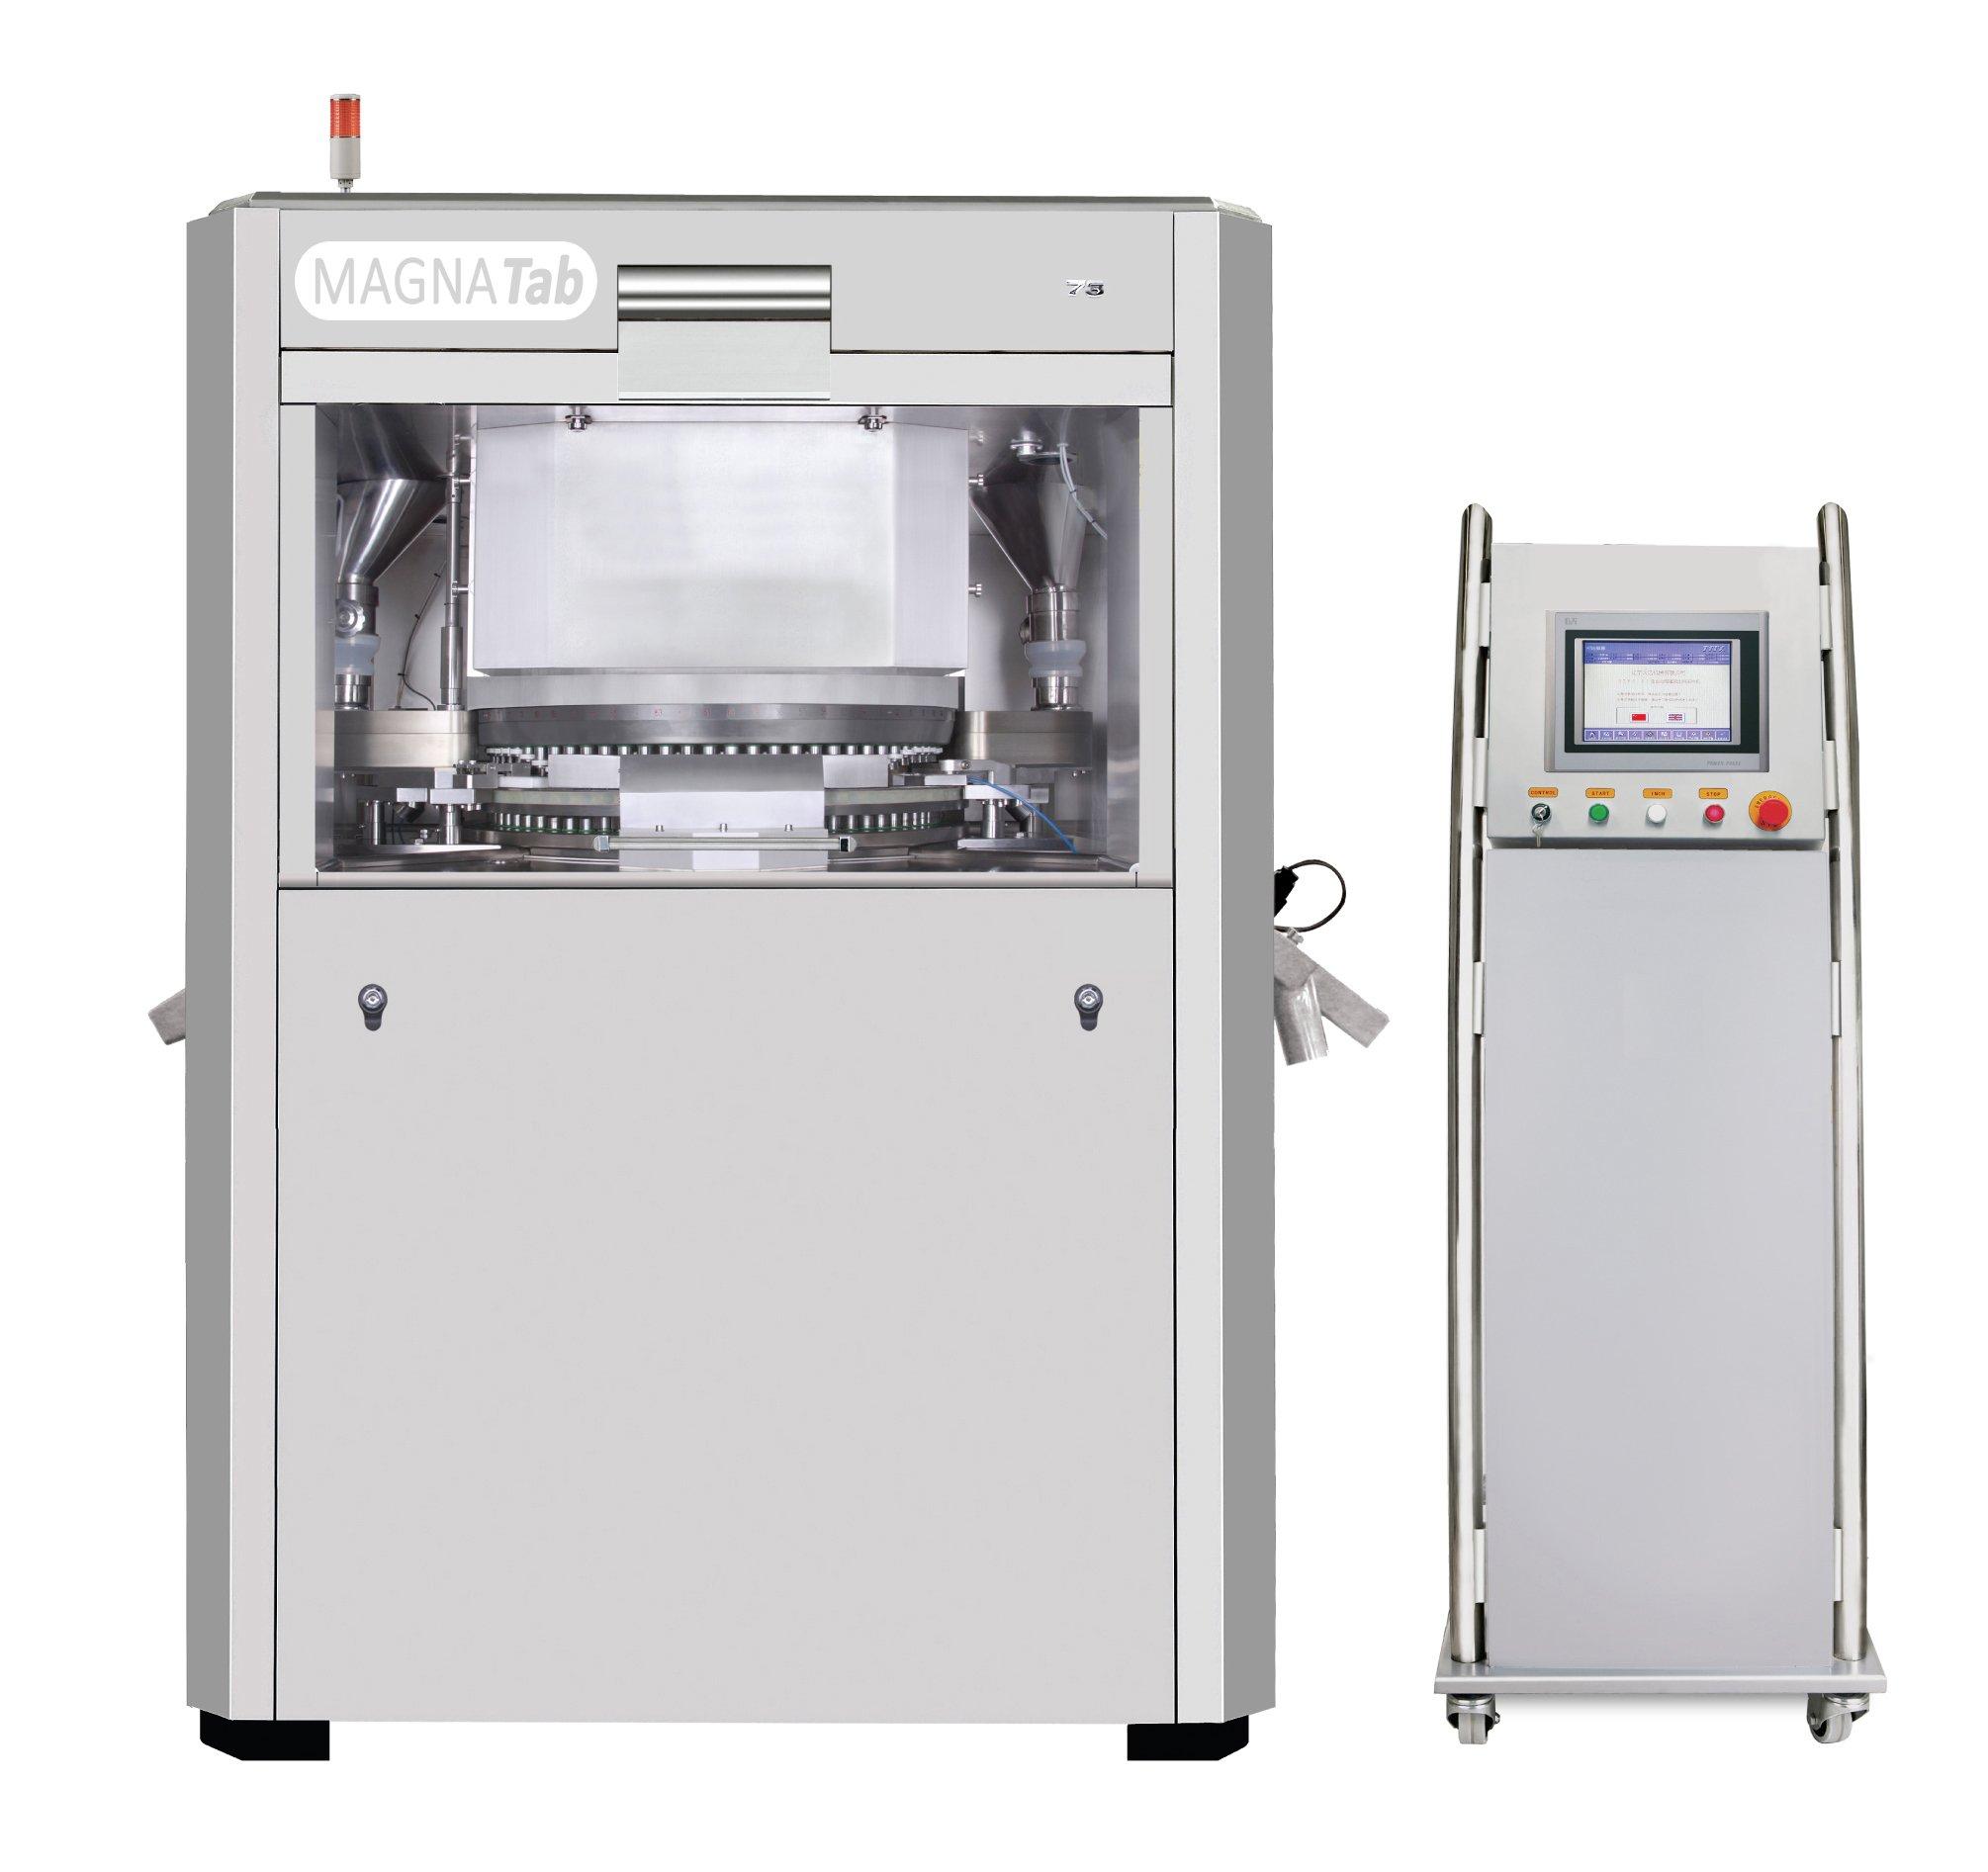 MagnaTab tebleting machines